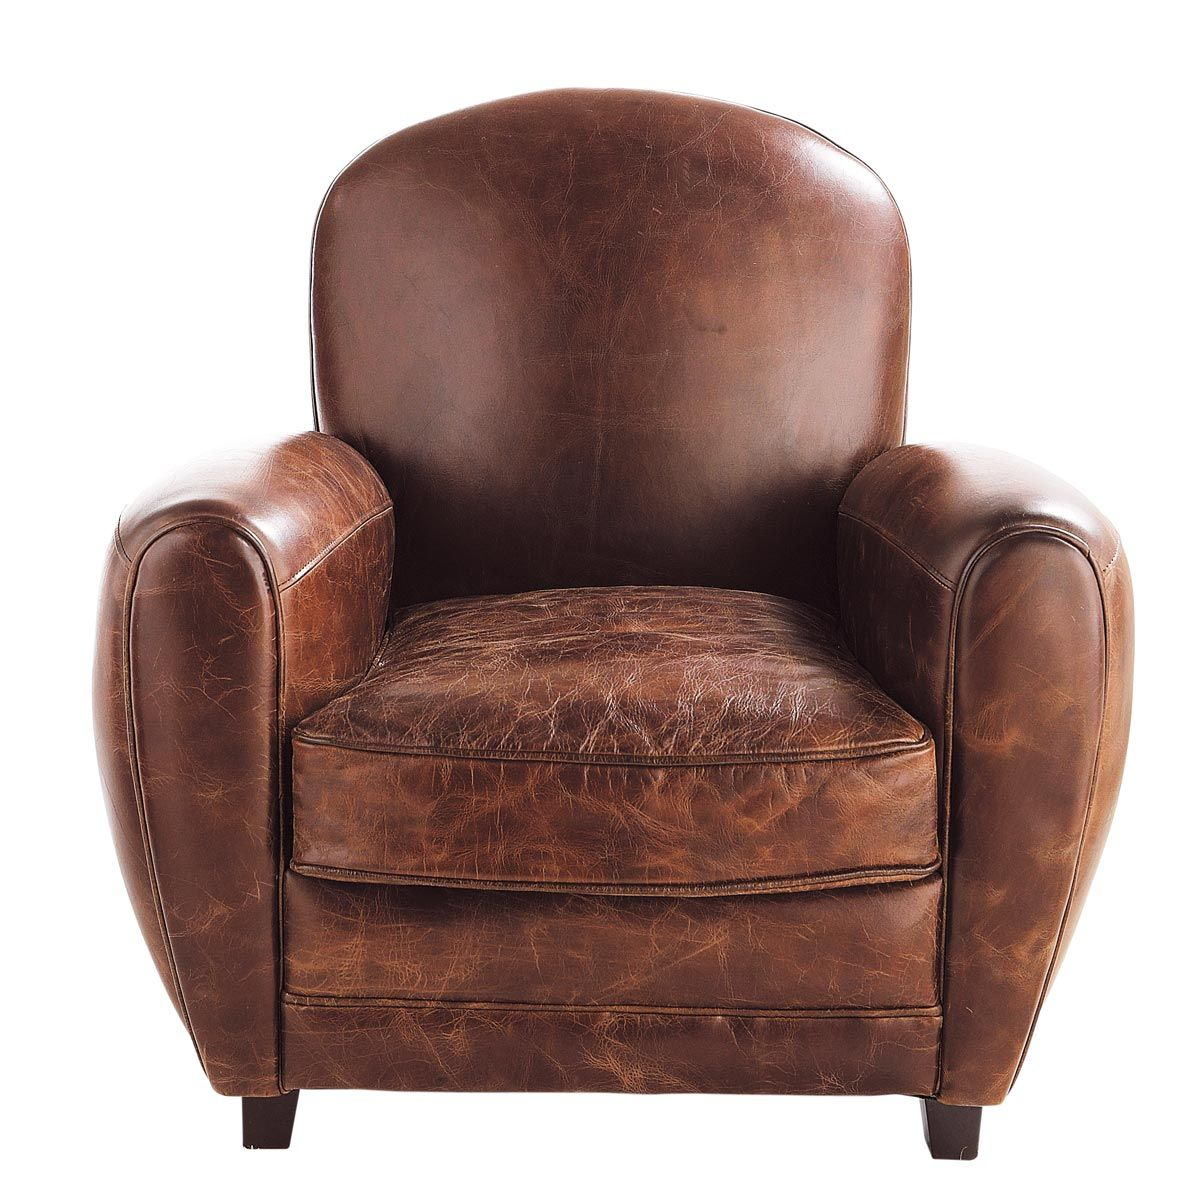 Poltrona Club Vintage.Poltrona Club Marrone In Cuoio Home Sweet Home Armchair